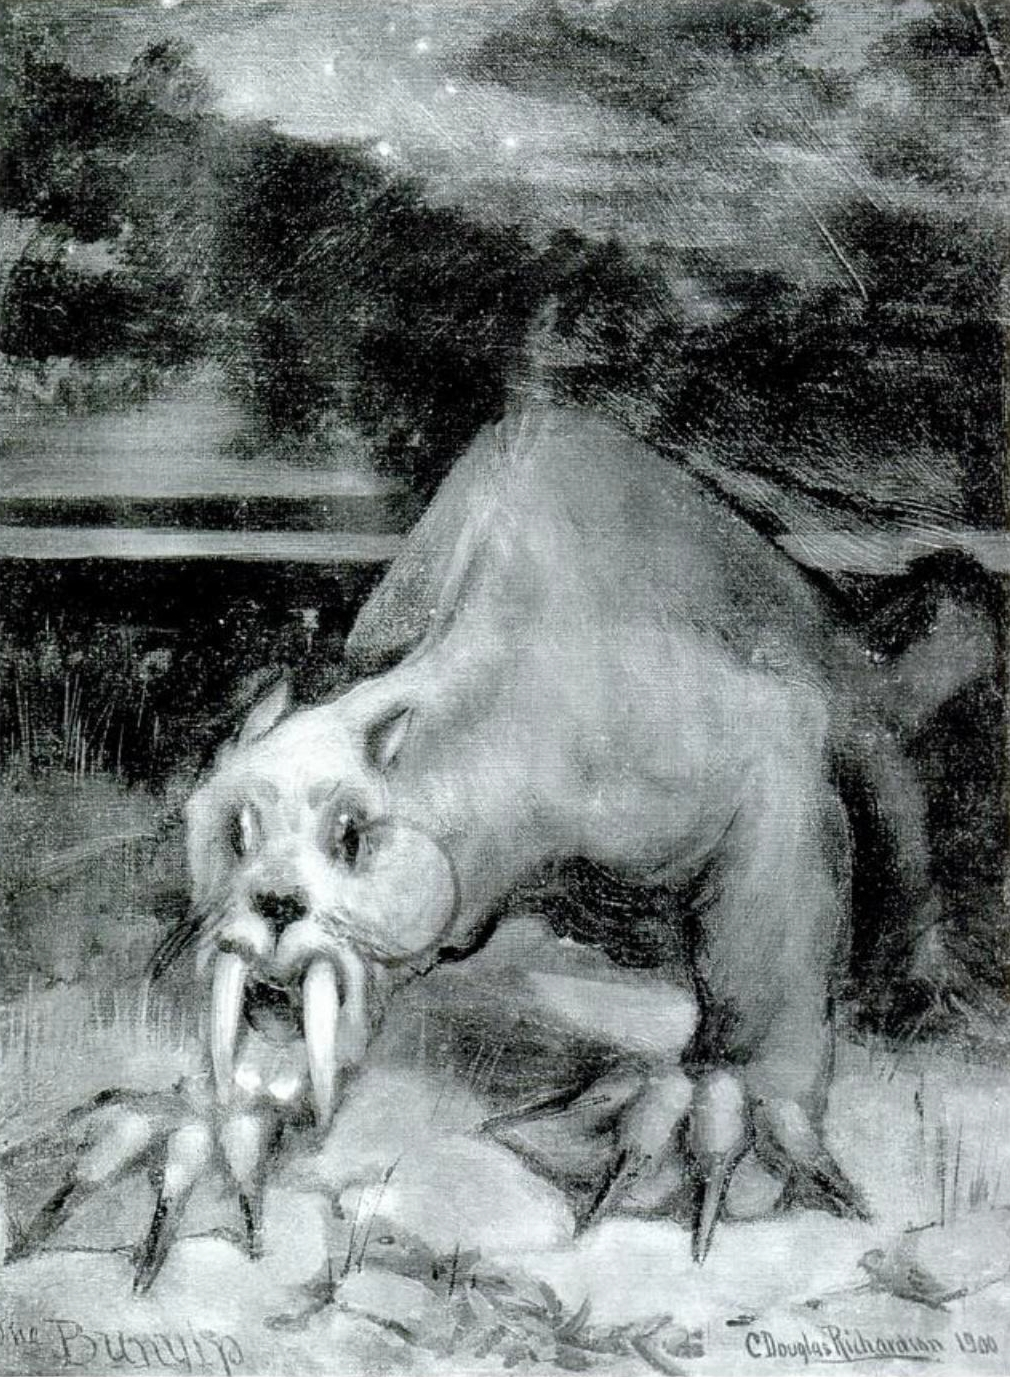 An image of the bunyip